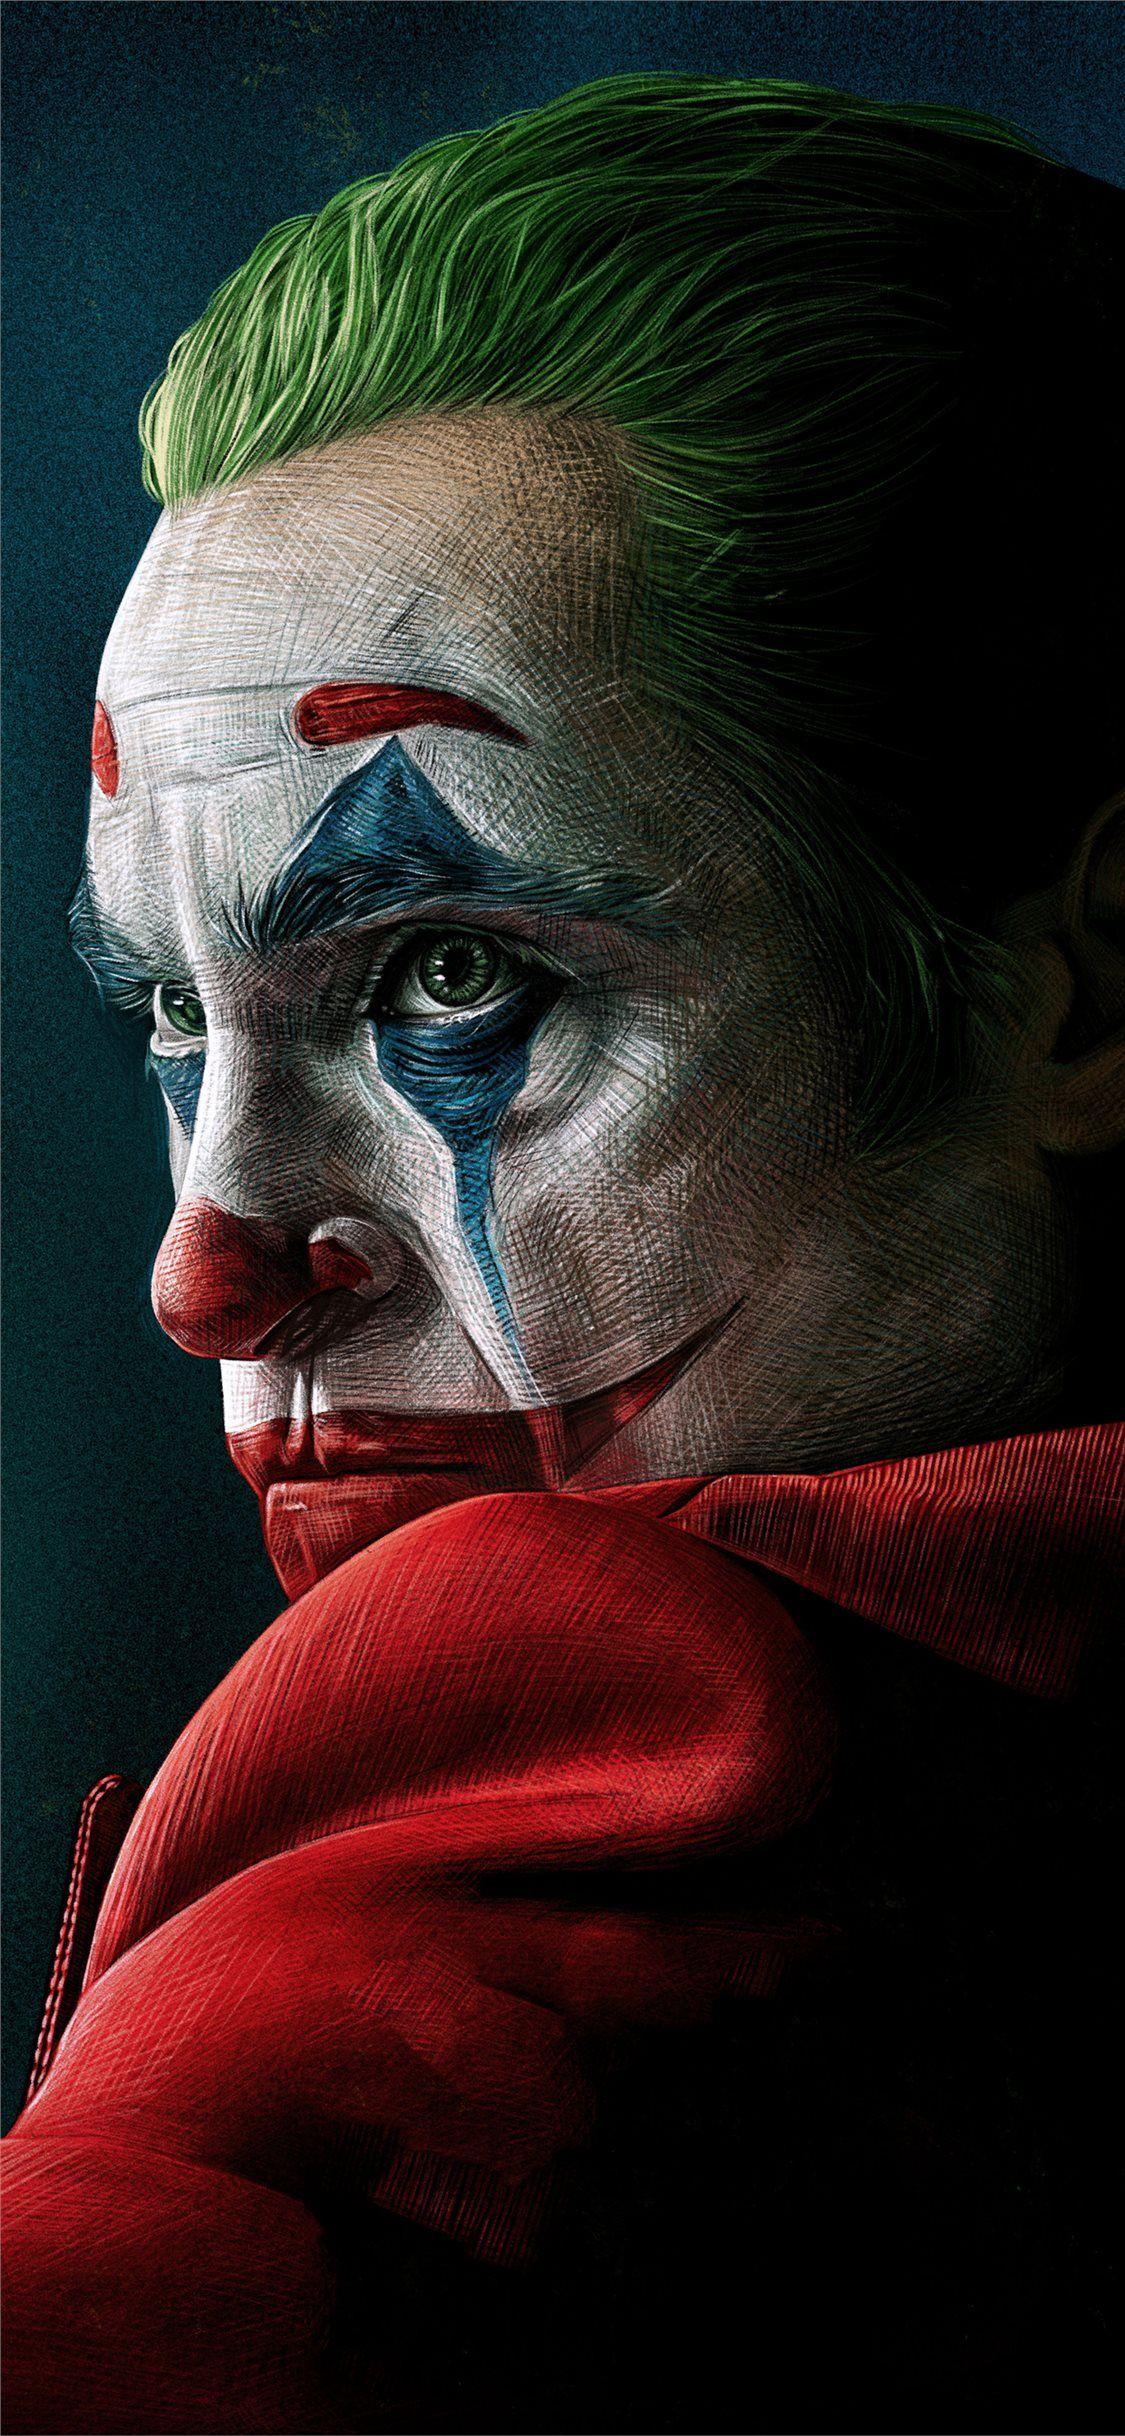 Joker Movie 4k Artwork Jokermovie Joker Superheroes Supervillain Artwork 4k Movies Iphone11wal In 2020 Joker Hd Wallpaper Joker Iphone Wallpaper Joker Painting